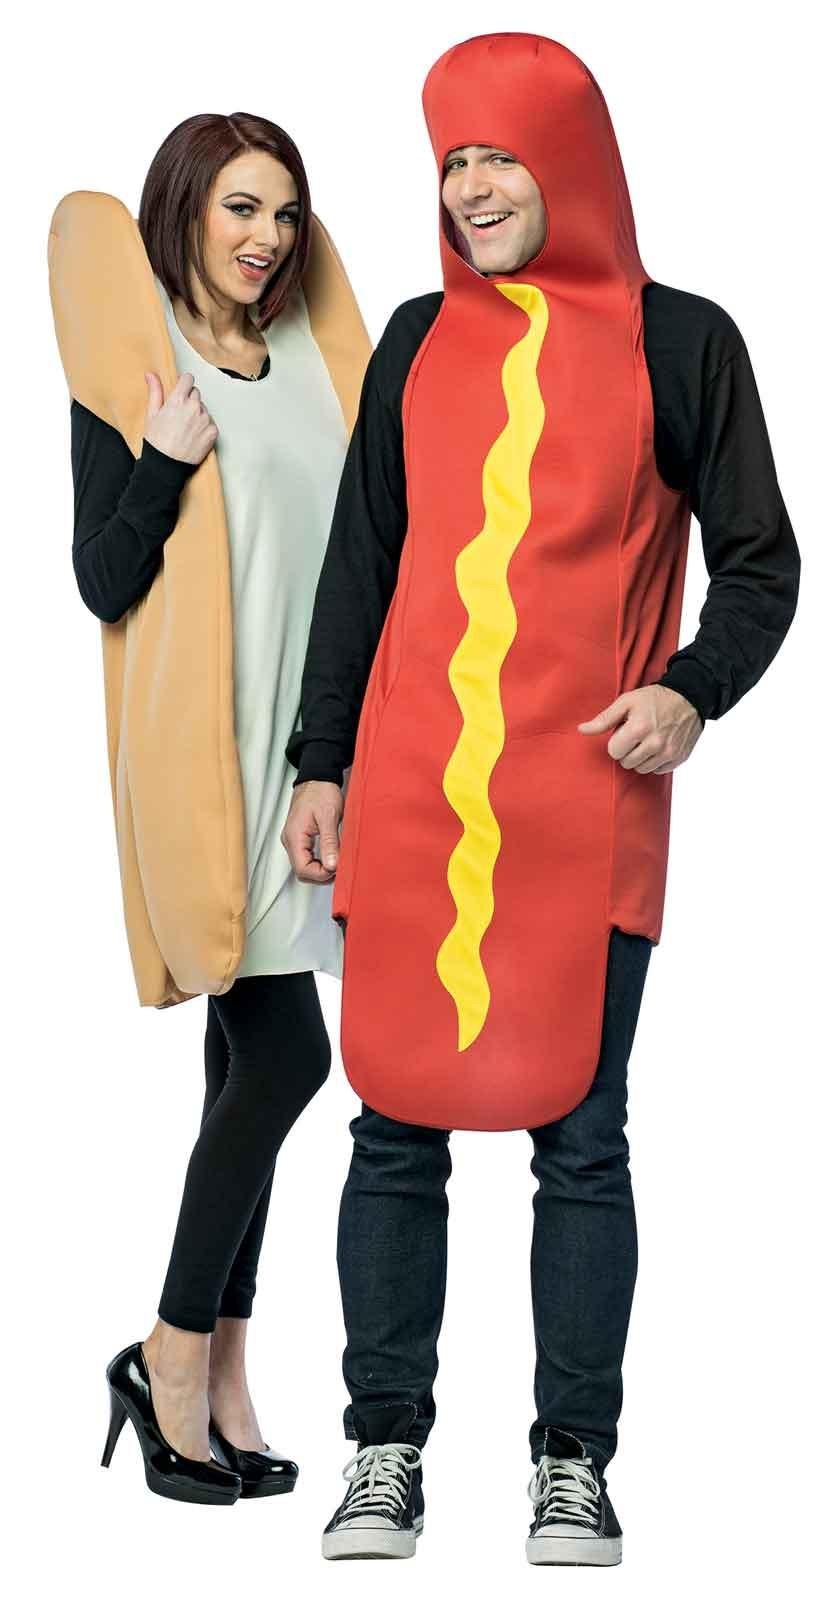 How To Make A Hot Dog Bun Costume